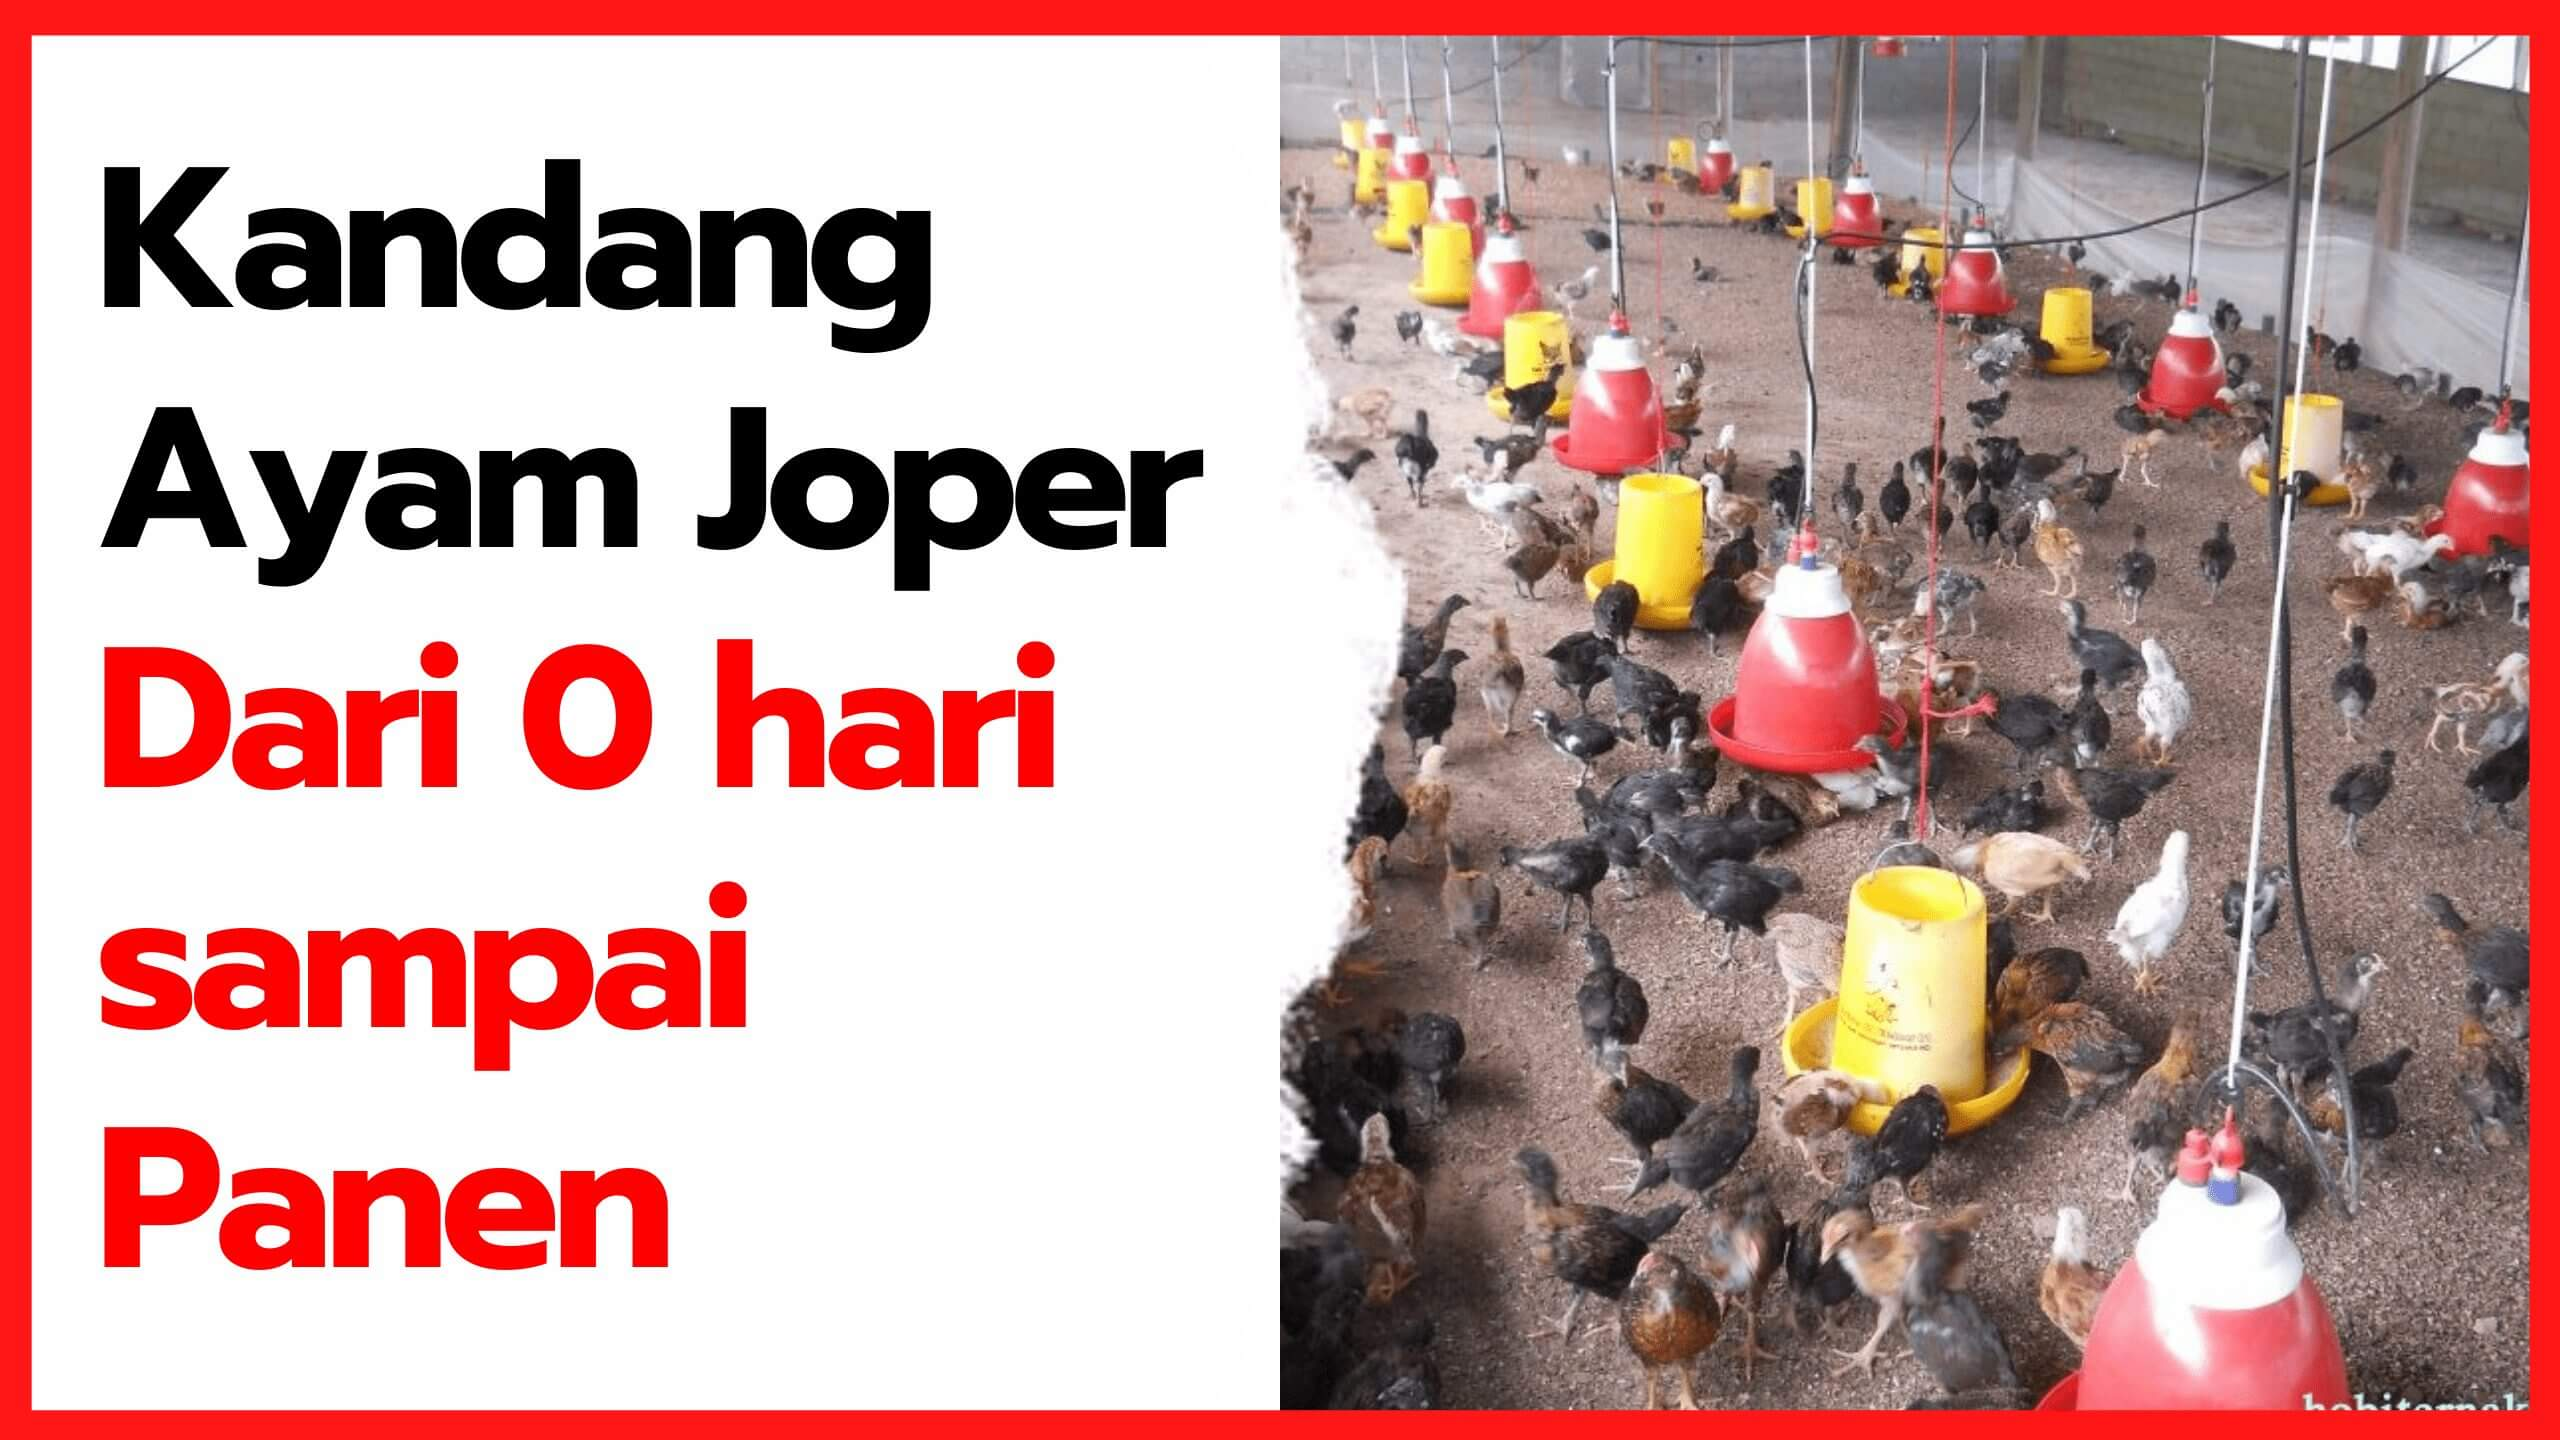 Kandang Ayam Kampung Super (JOPER) Dari Nol Hari Sampai Panen